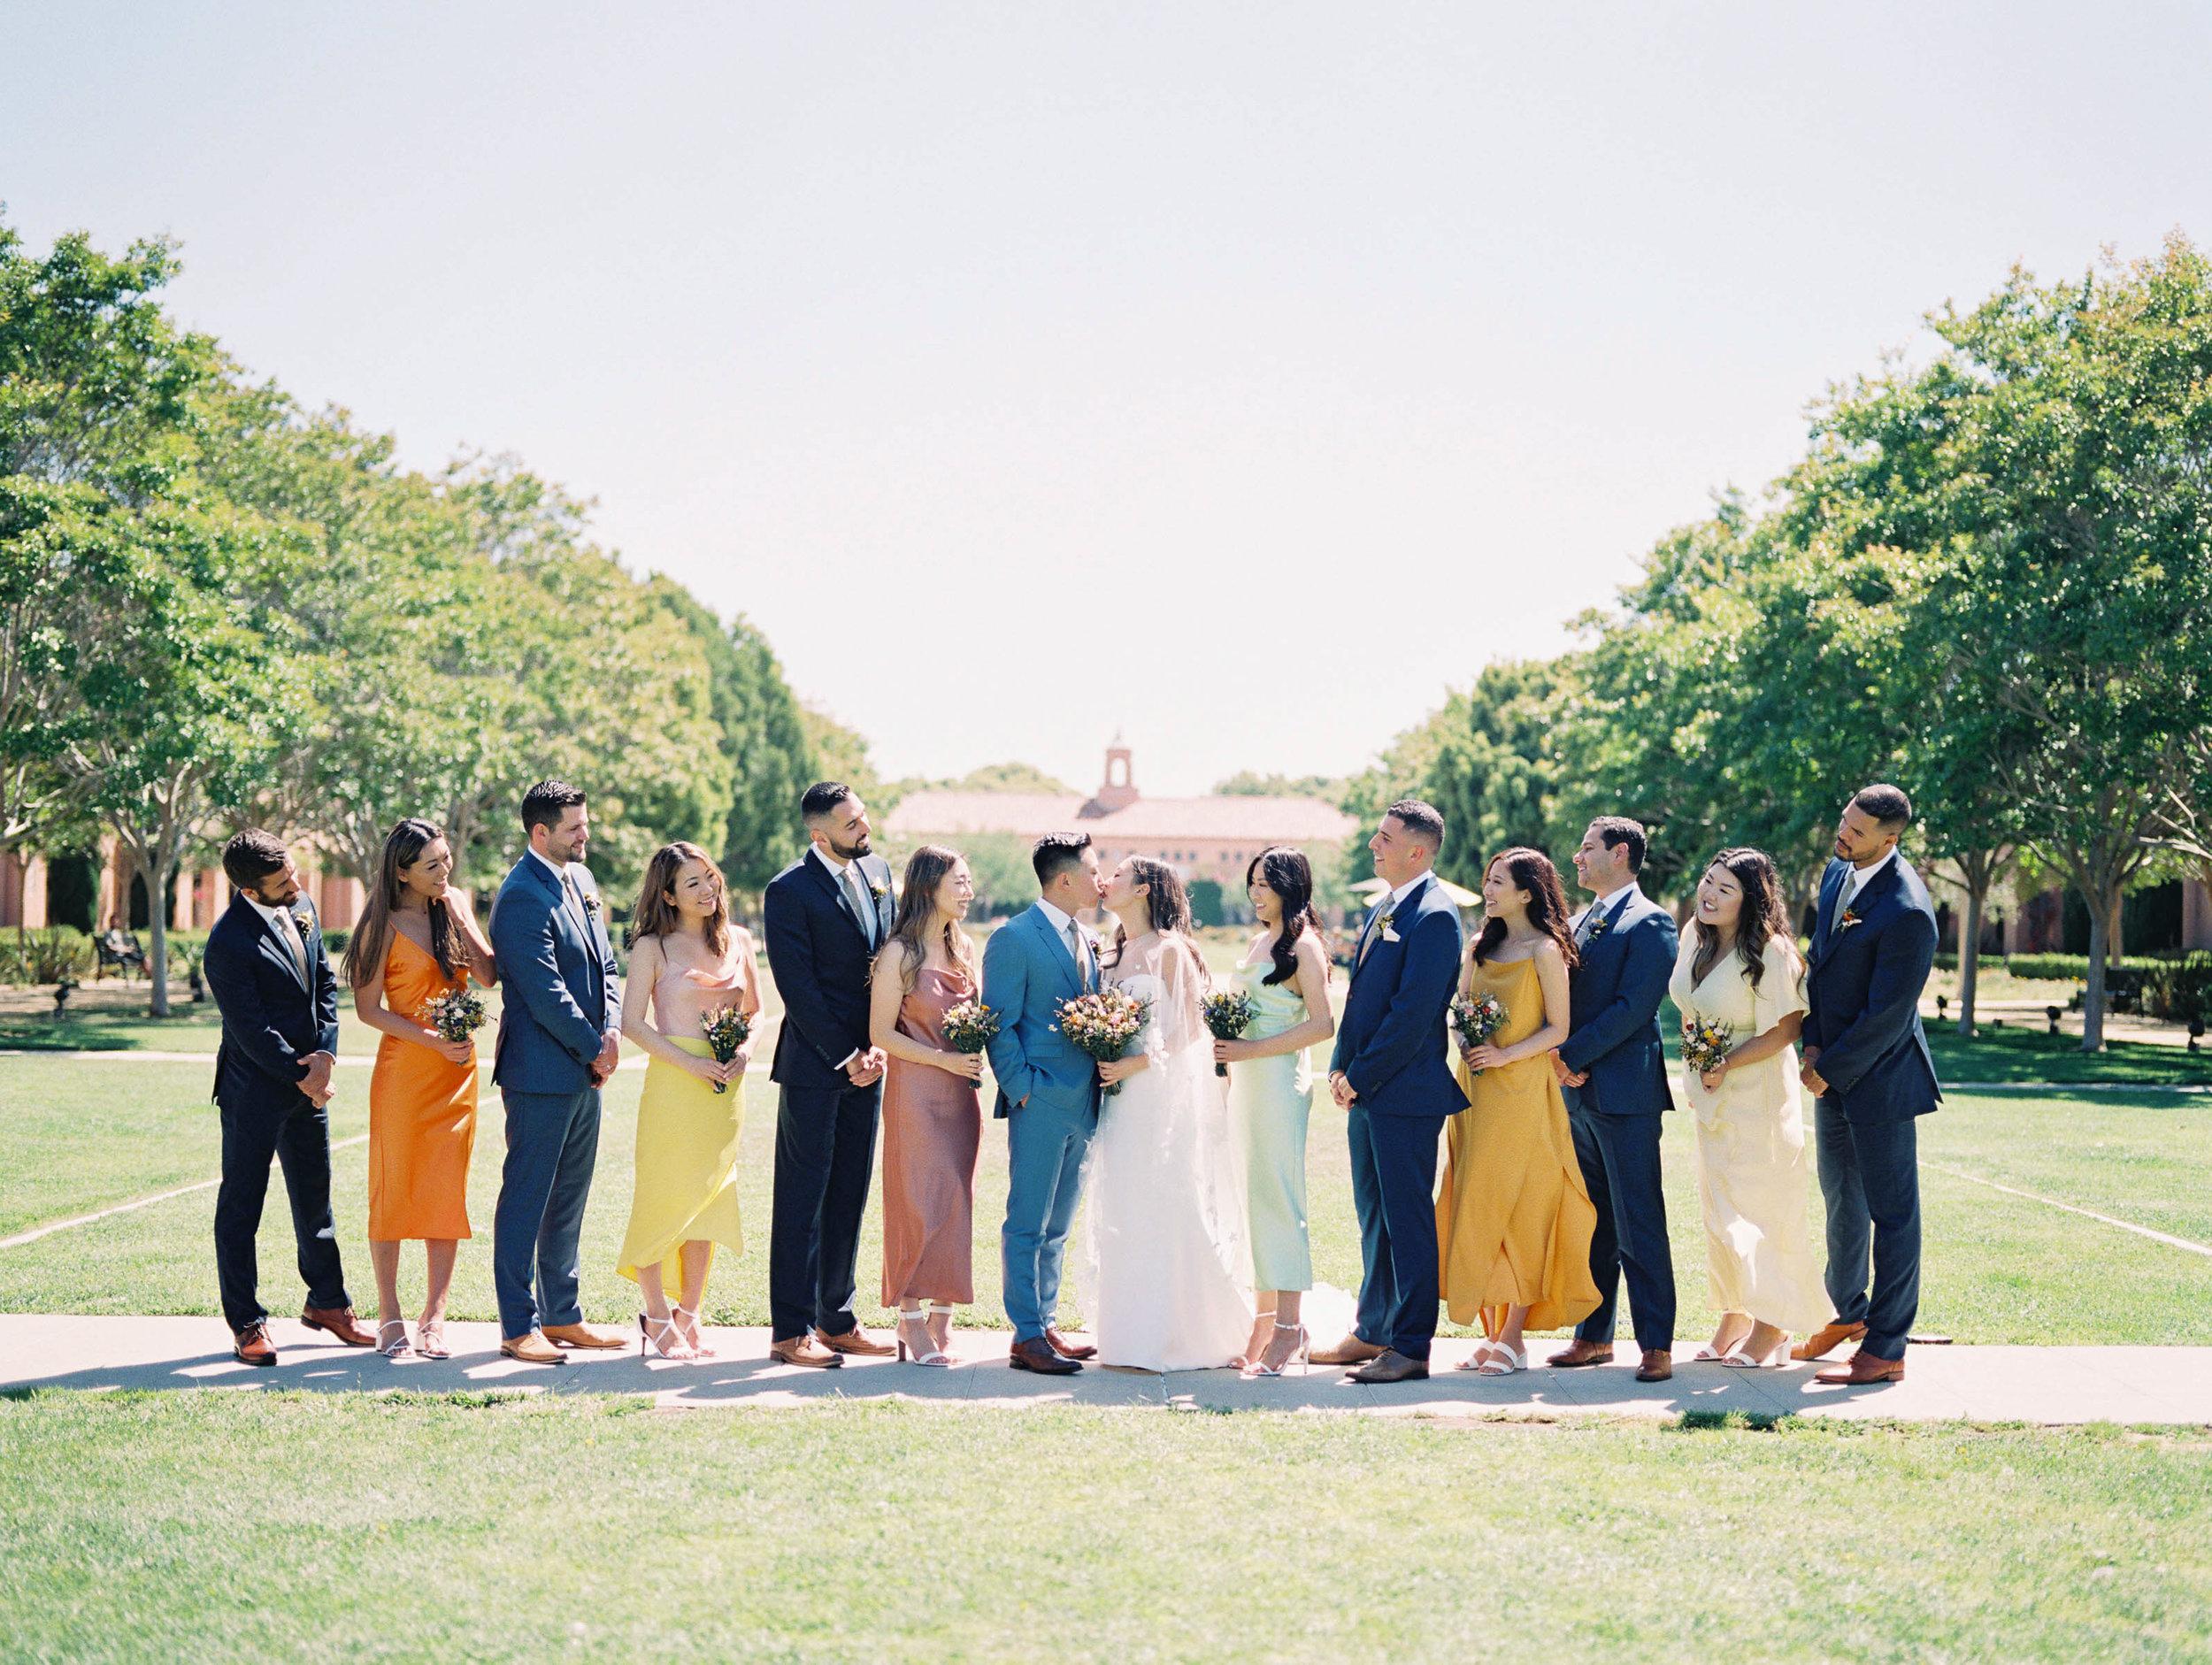 san-diego-building-177-los-angeles-wedding-picture-141.jpg